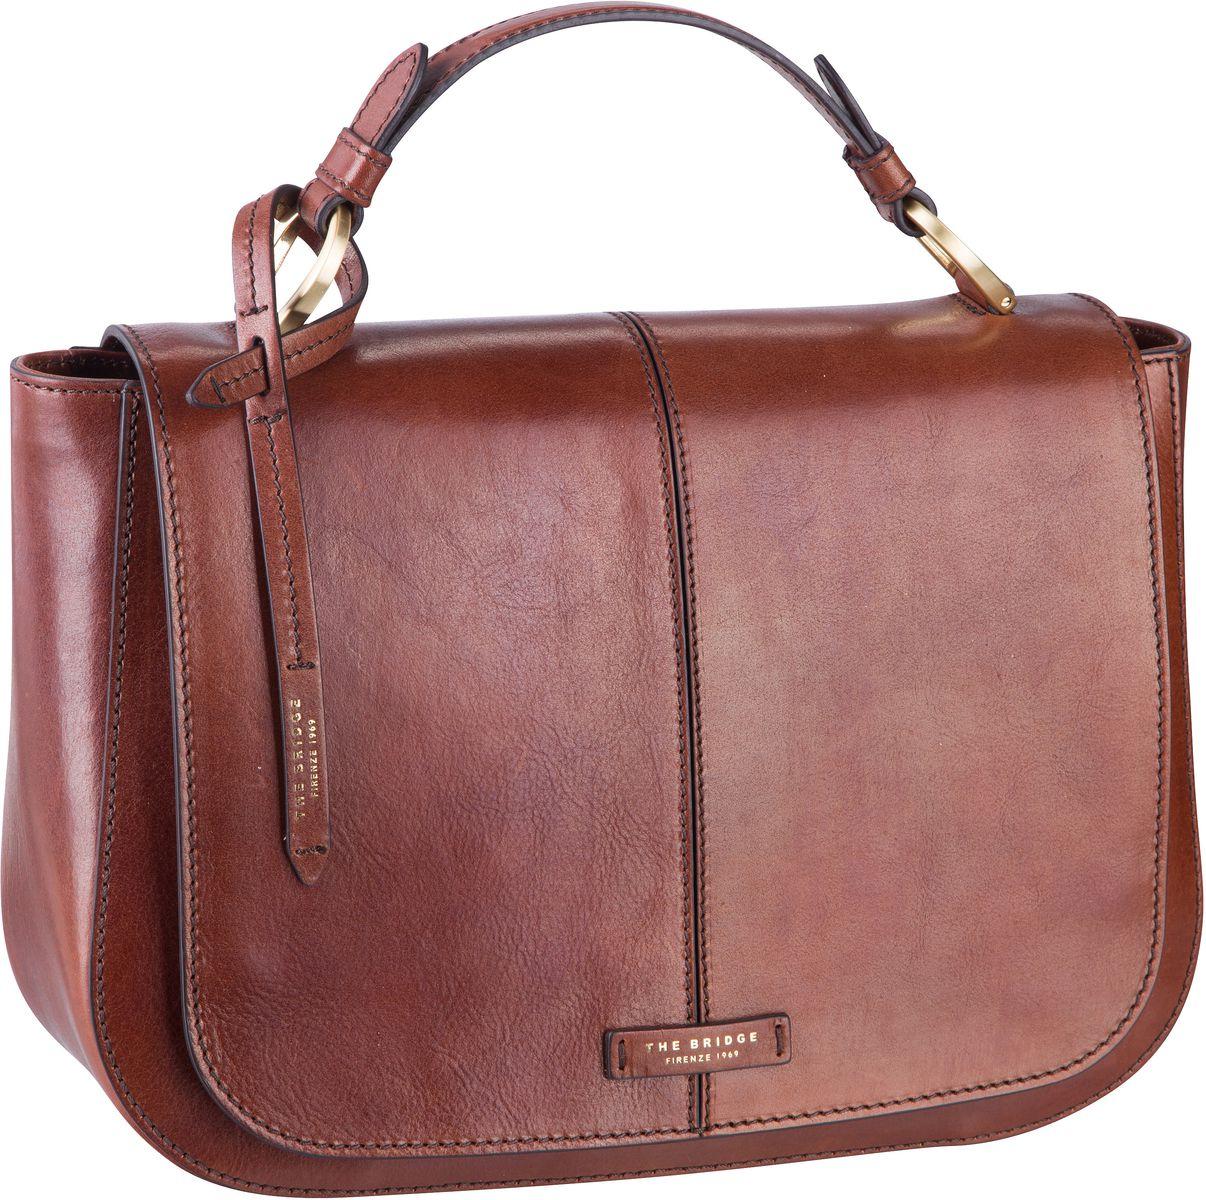 Handtasche Faentina Handtasche 4659 Marrone